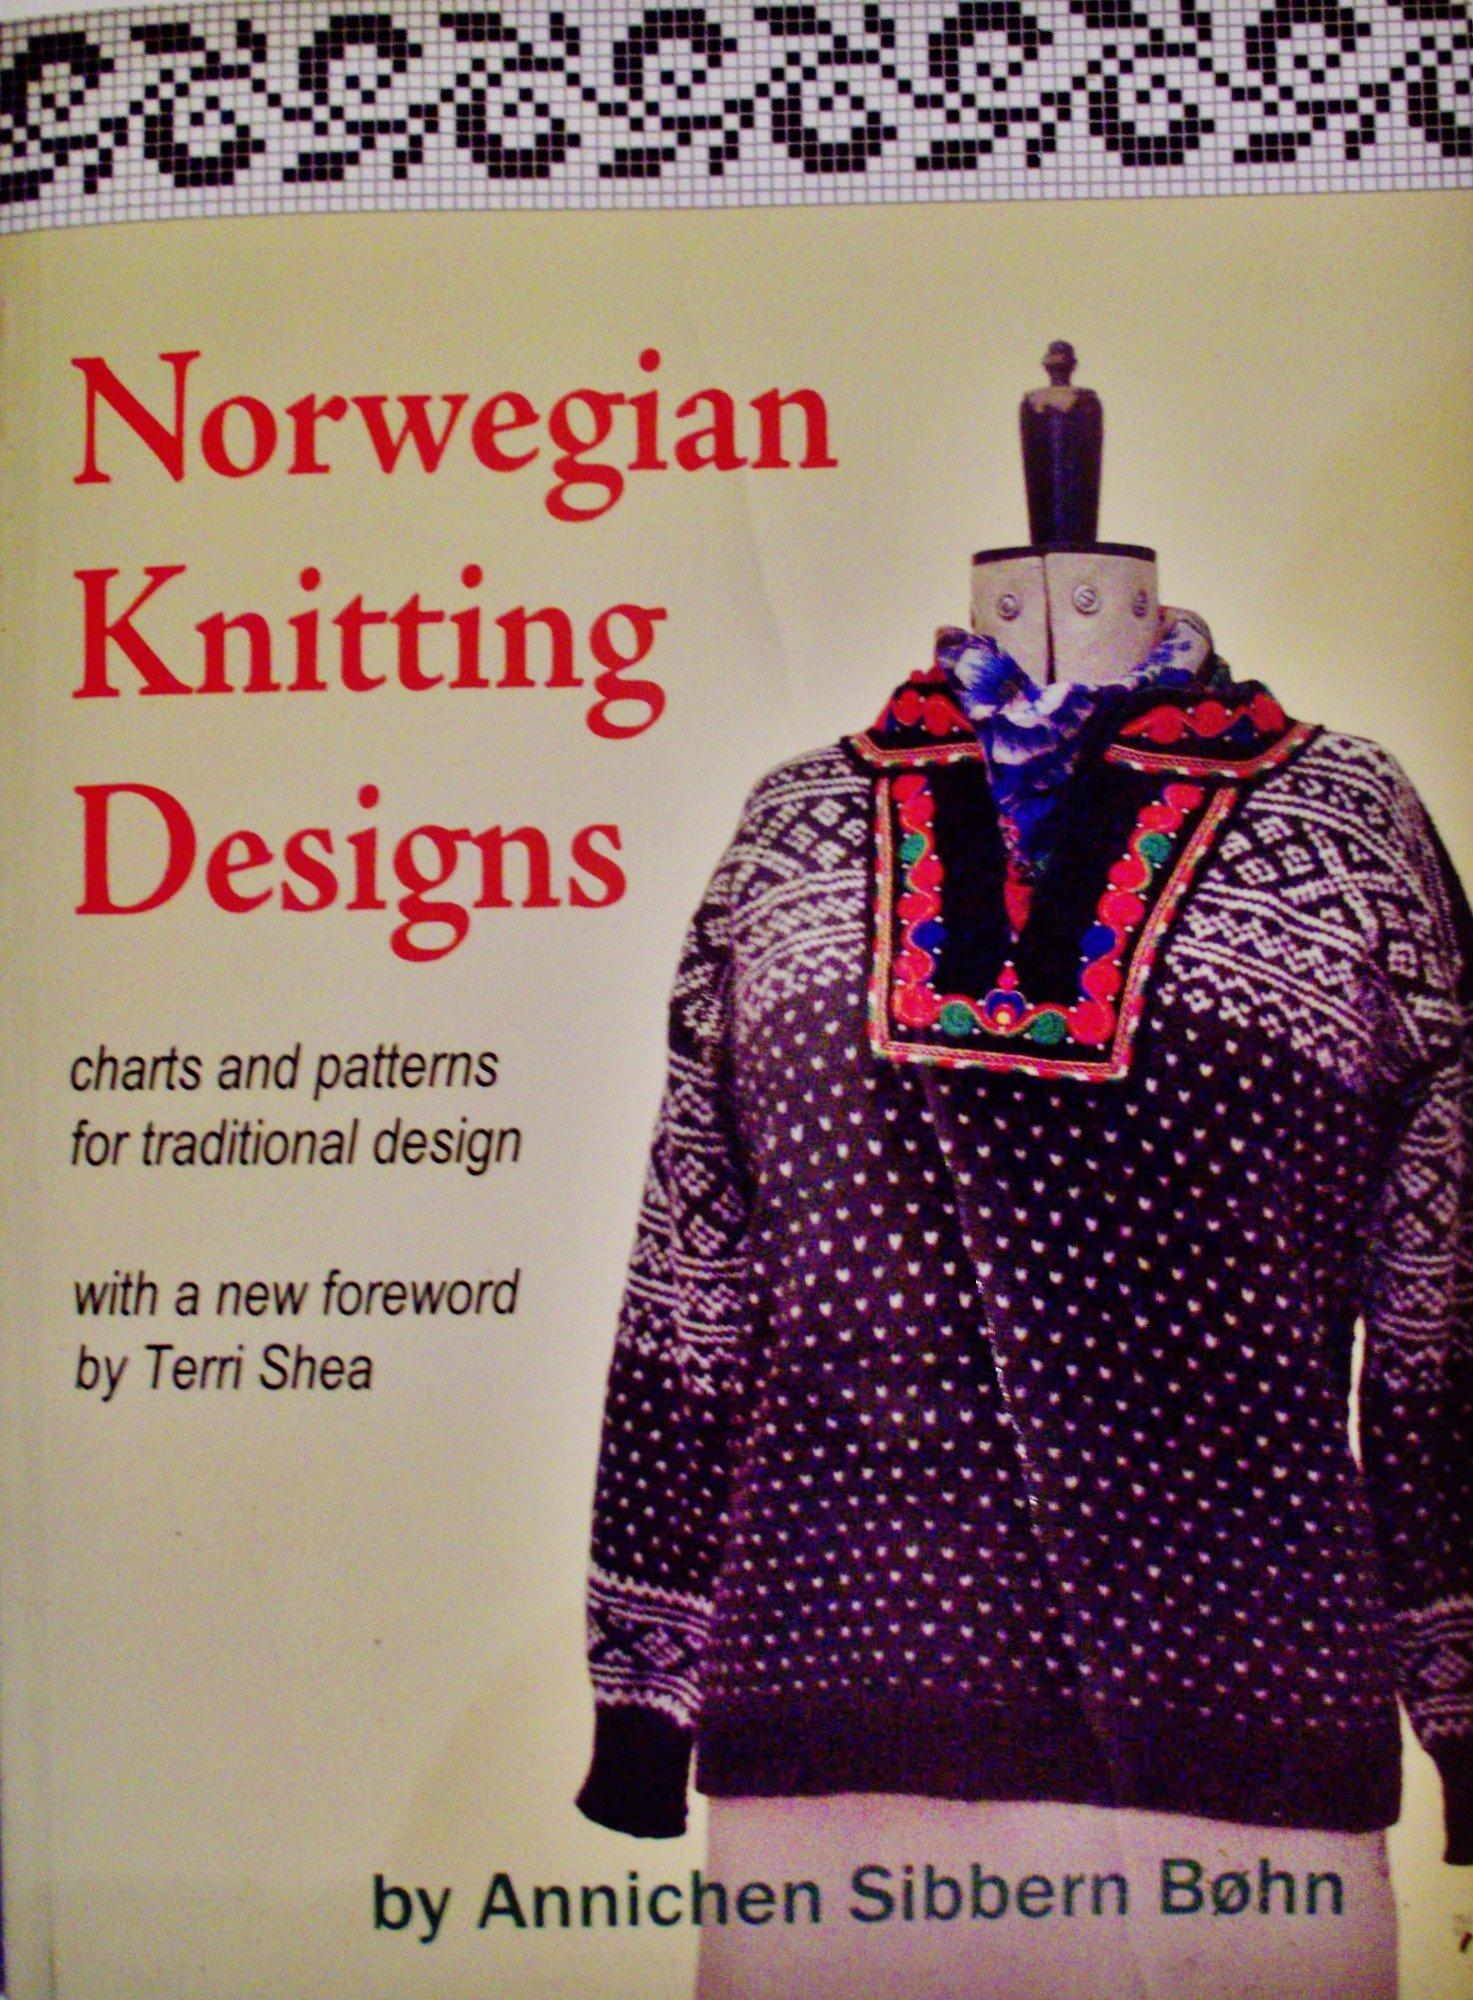 Norwegian Knitting Designs Annichen Sibbern Bohn Terri Shea 9780979312618 Amazon Com Books